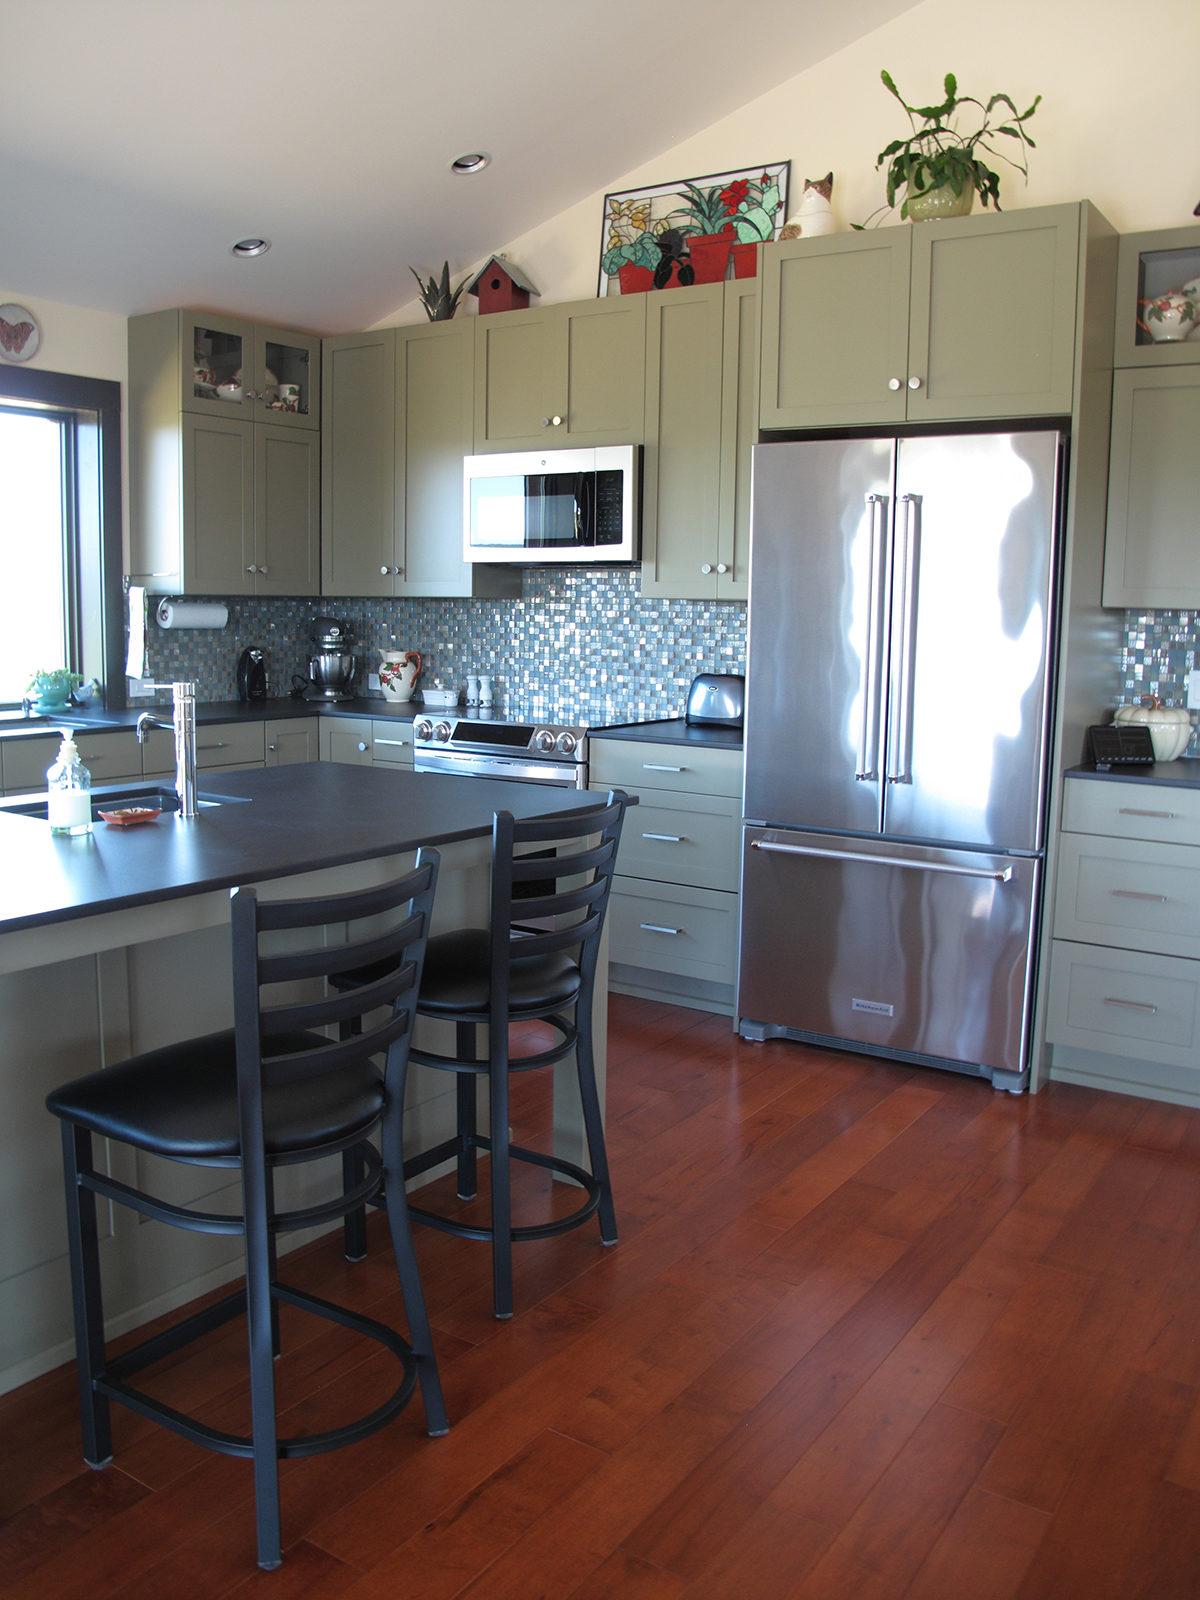 Homebuilding Annual Kitchens Baths Issue